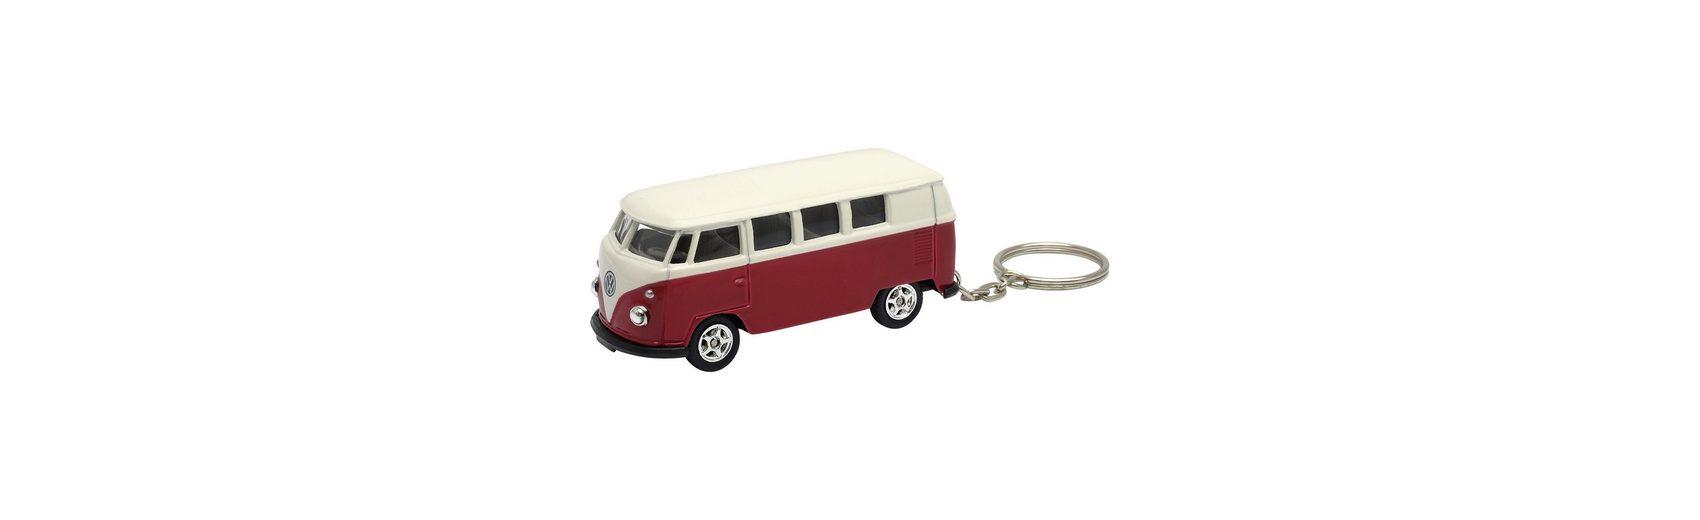 Welly Schlüsselanhänger Bulli VW T1 rot/weiß